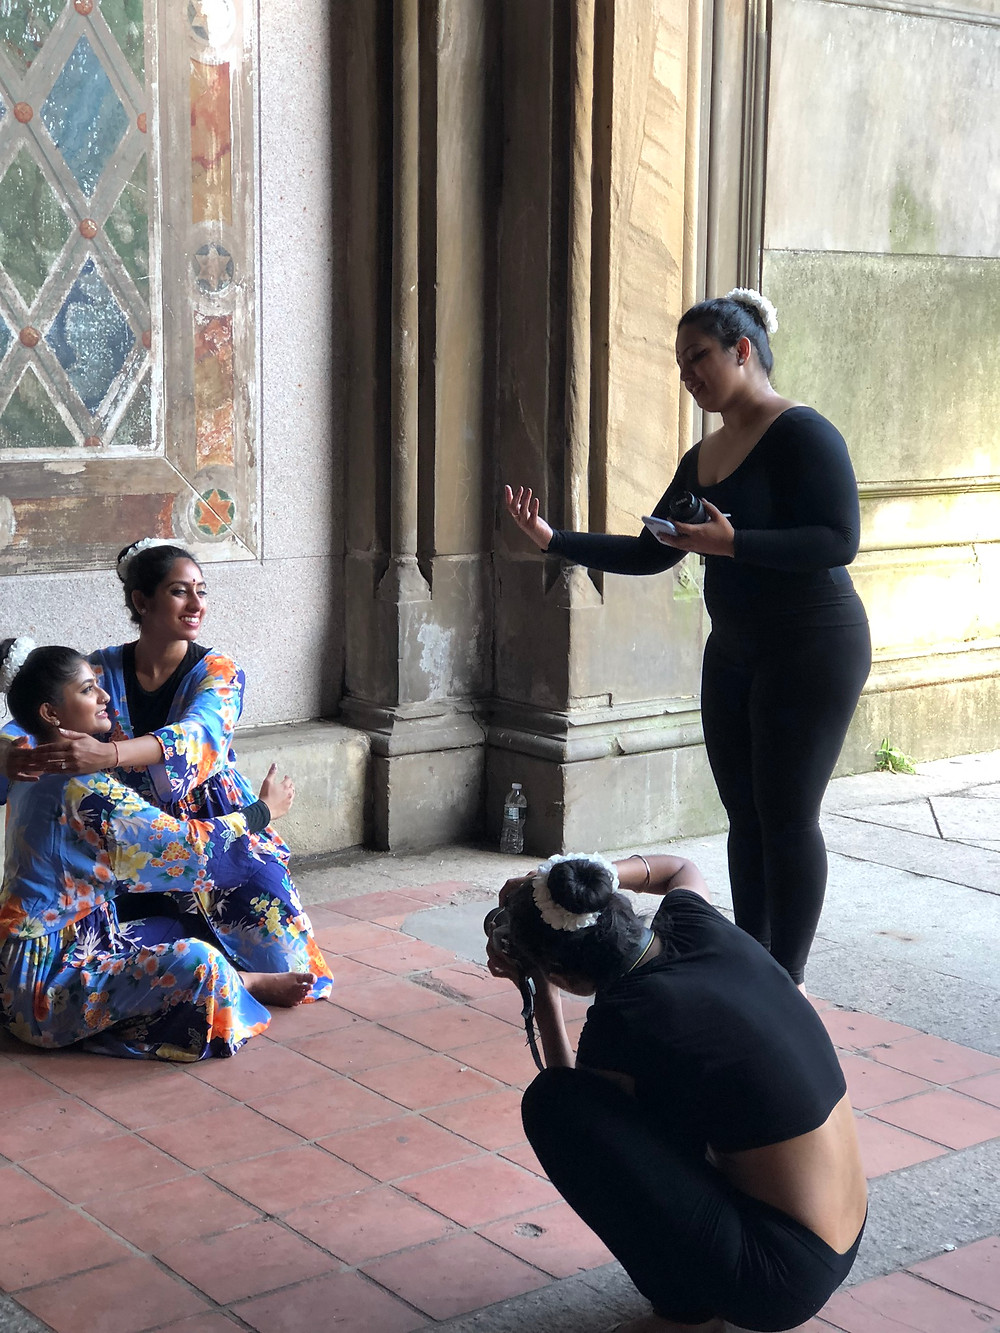 Noor Dance Academy NYC – abhinaya photoshoot bts behind the scenes